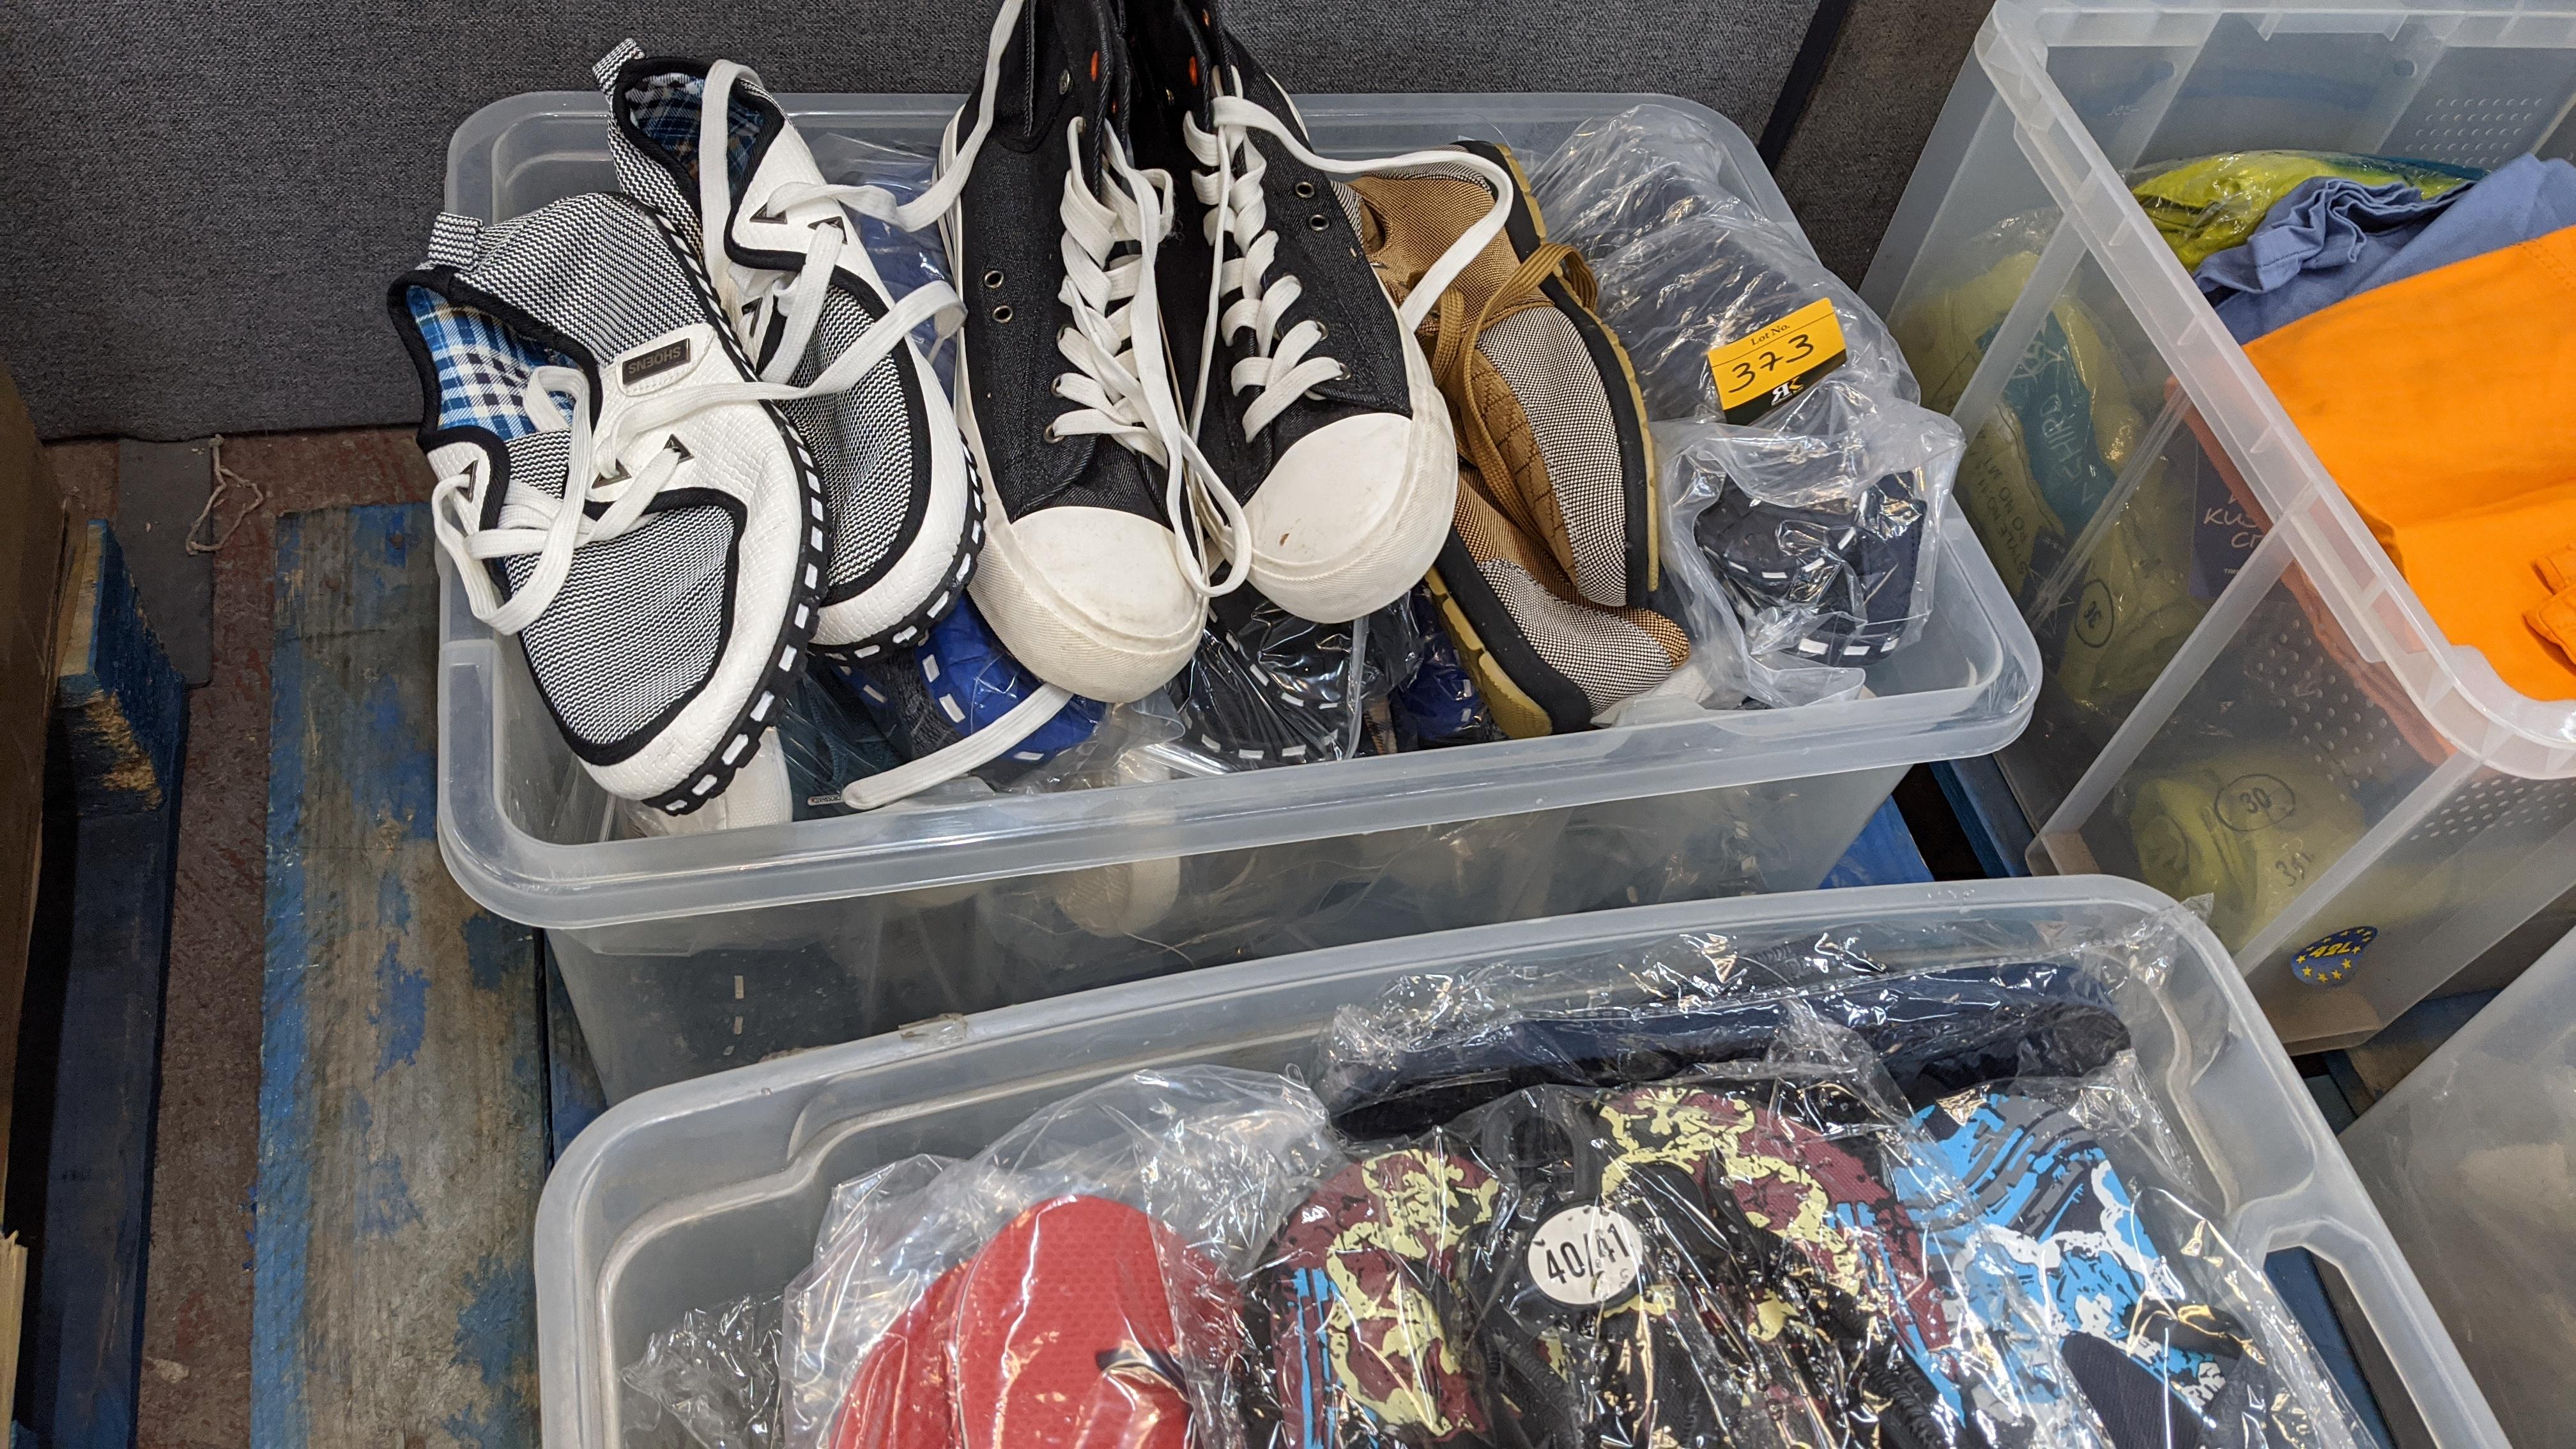 Very large quantity of primarily men's designer clothing & accessories. - Image 136 of 157